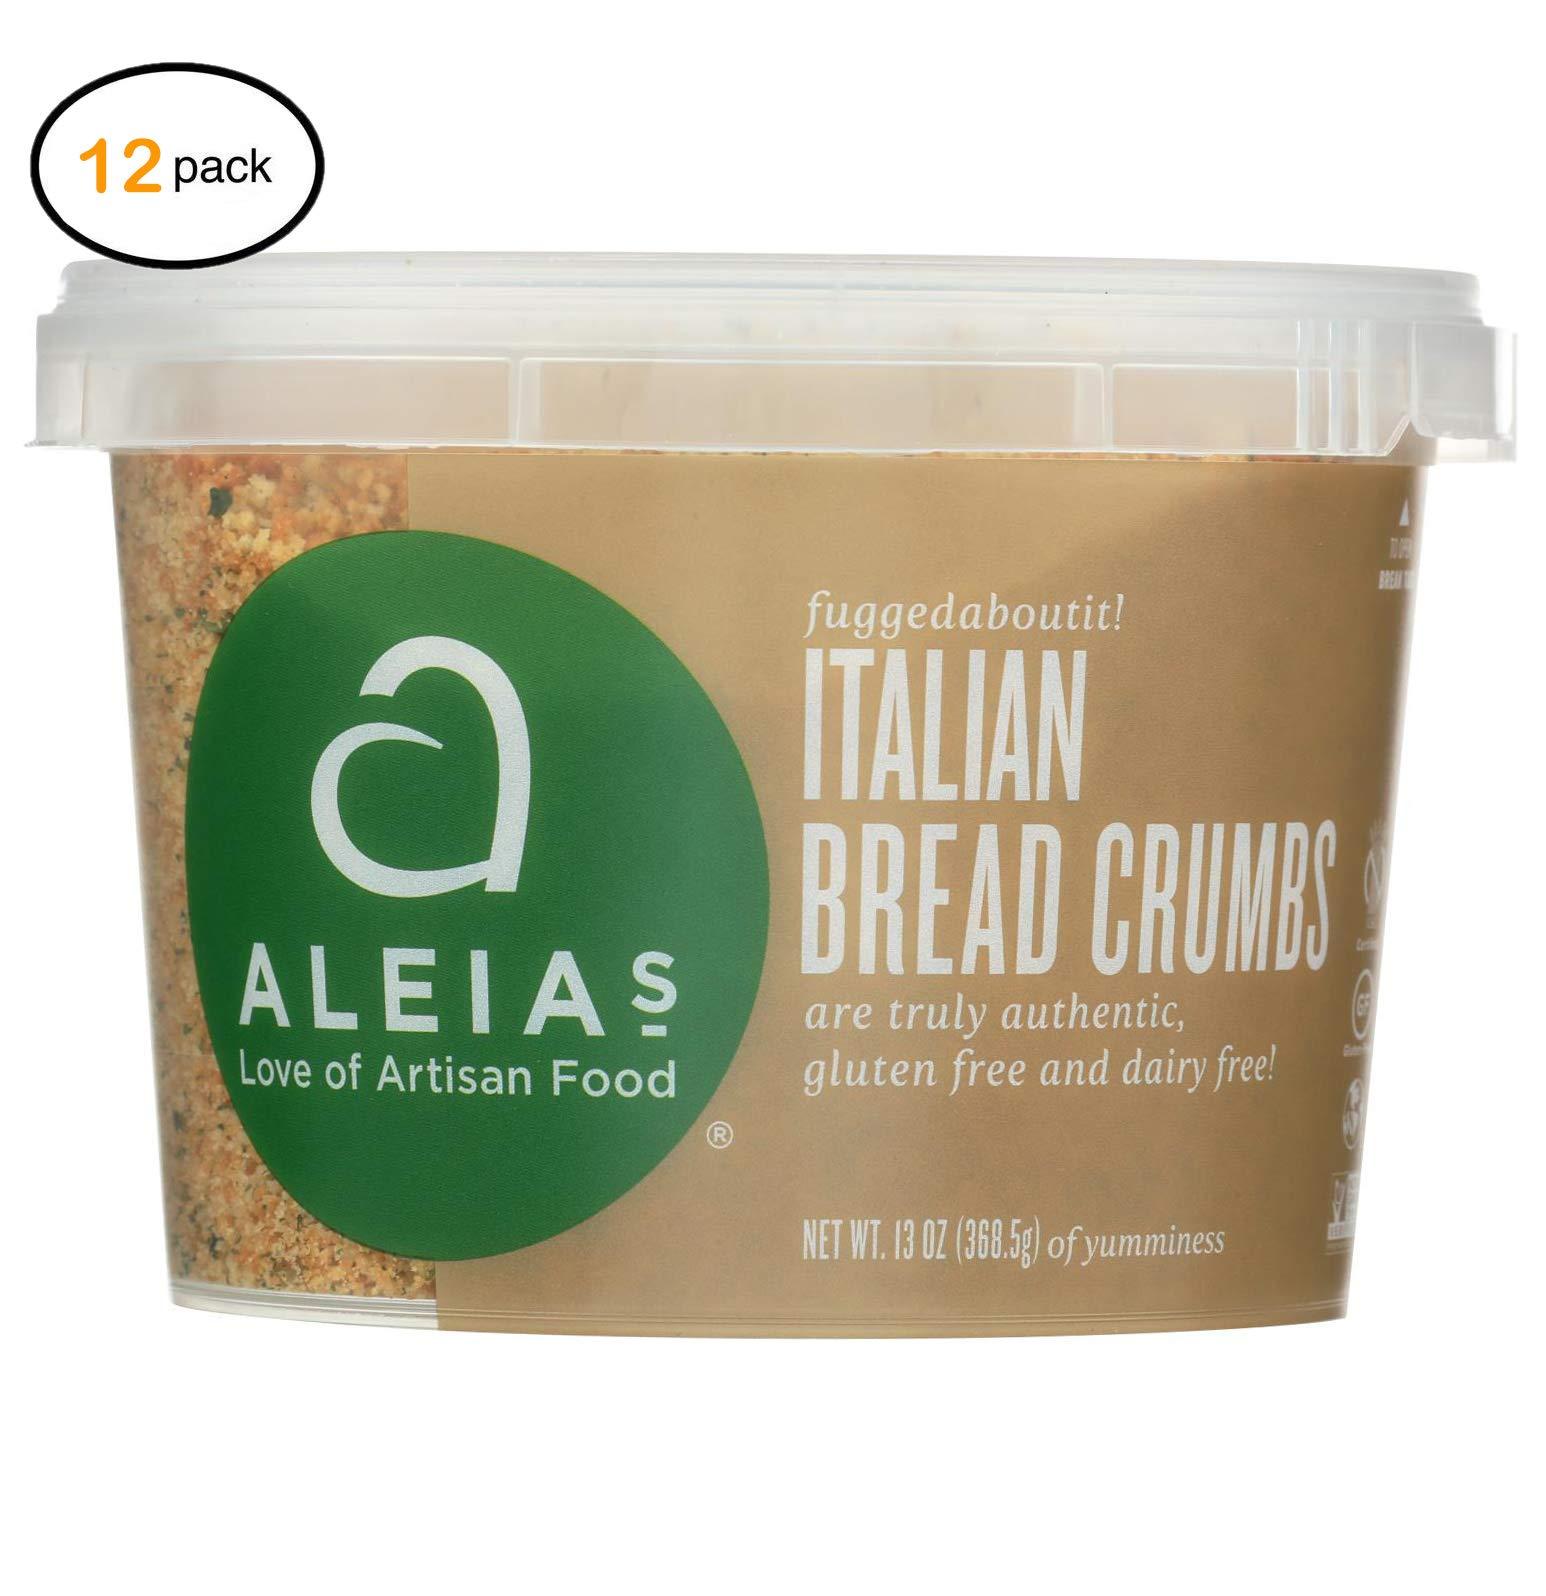 Alеia's Glutеn Frее Brеad Crumbs - Italian - Casе оf 12-13 оz. - Bulk Buy